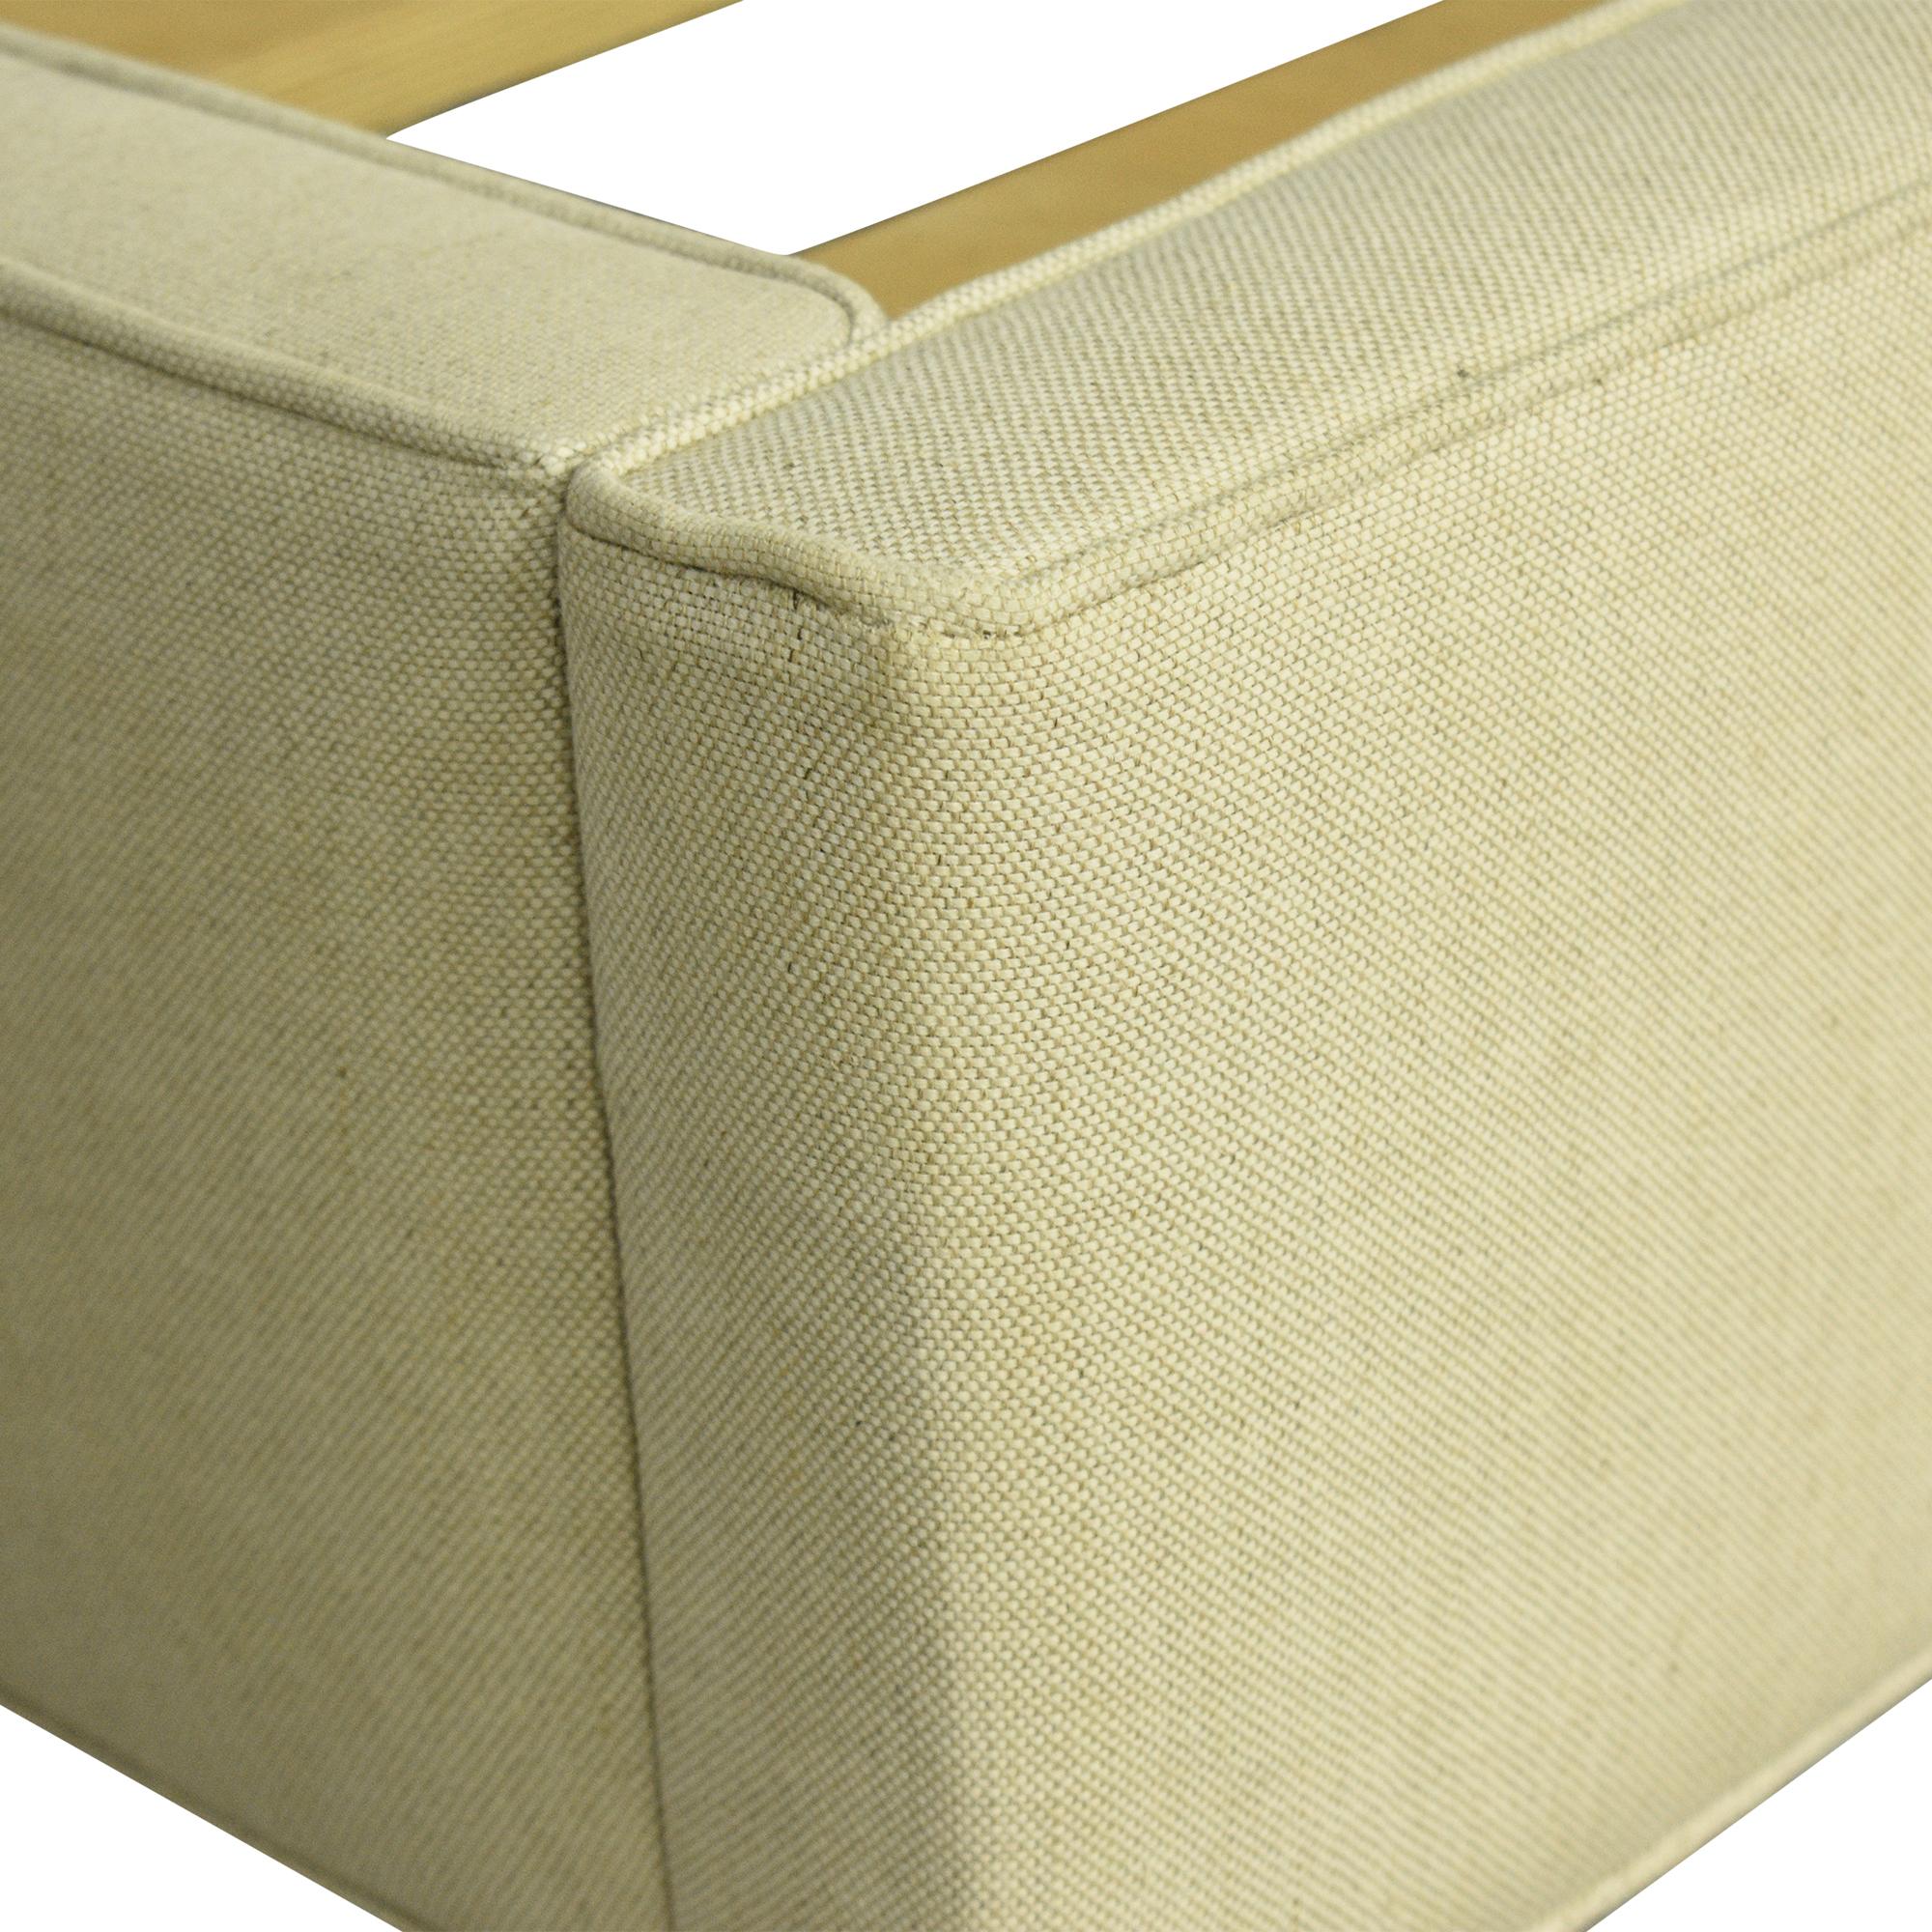 Crate & Barrel Colette Upholstered Queen Bed Crate & Barrel